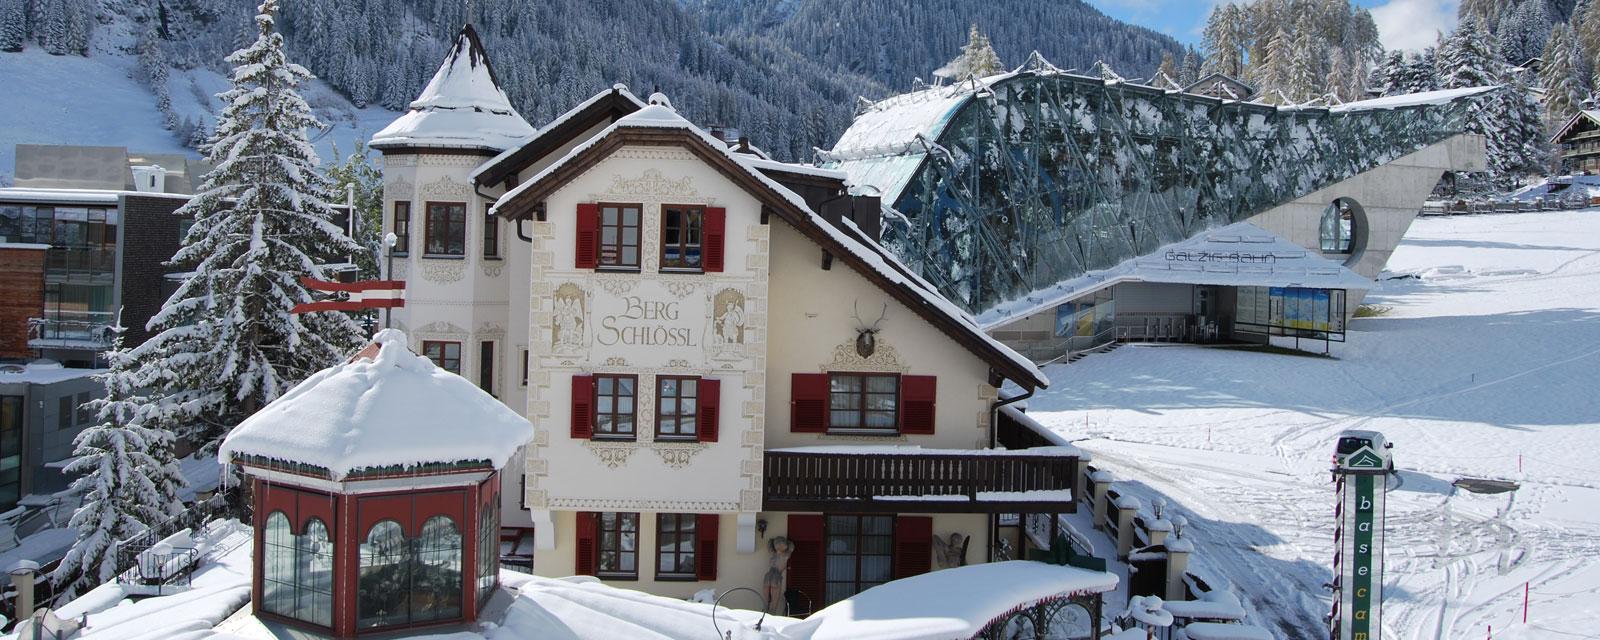 Das Bergschlössl in St. Anton am Arlberg im Winter